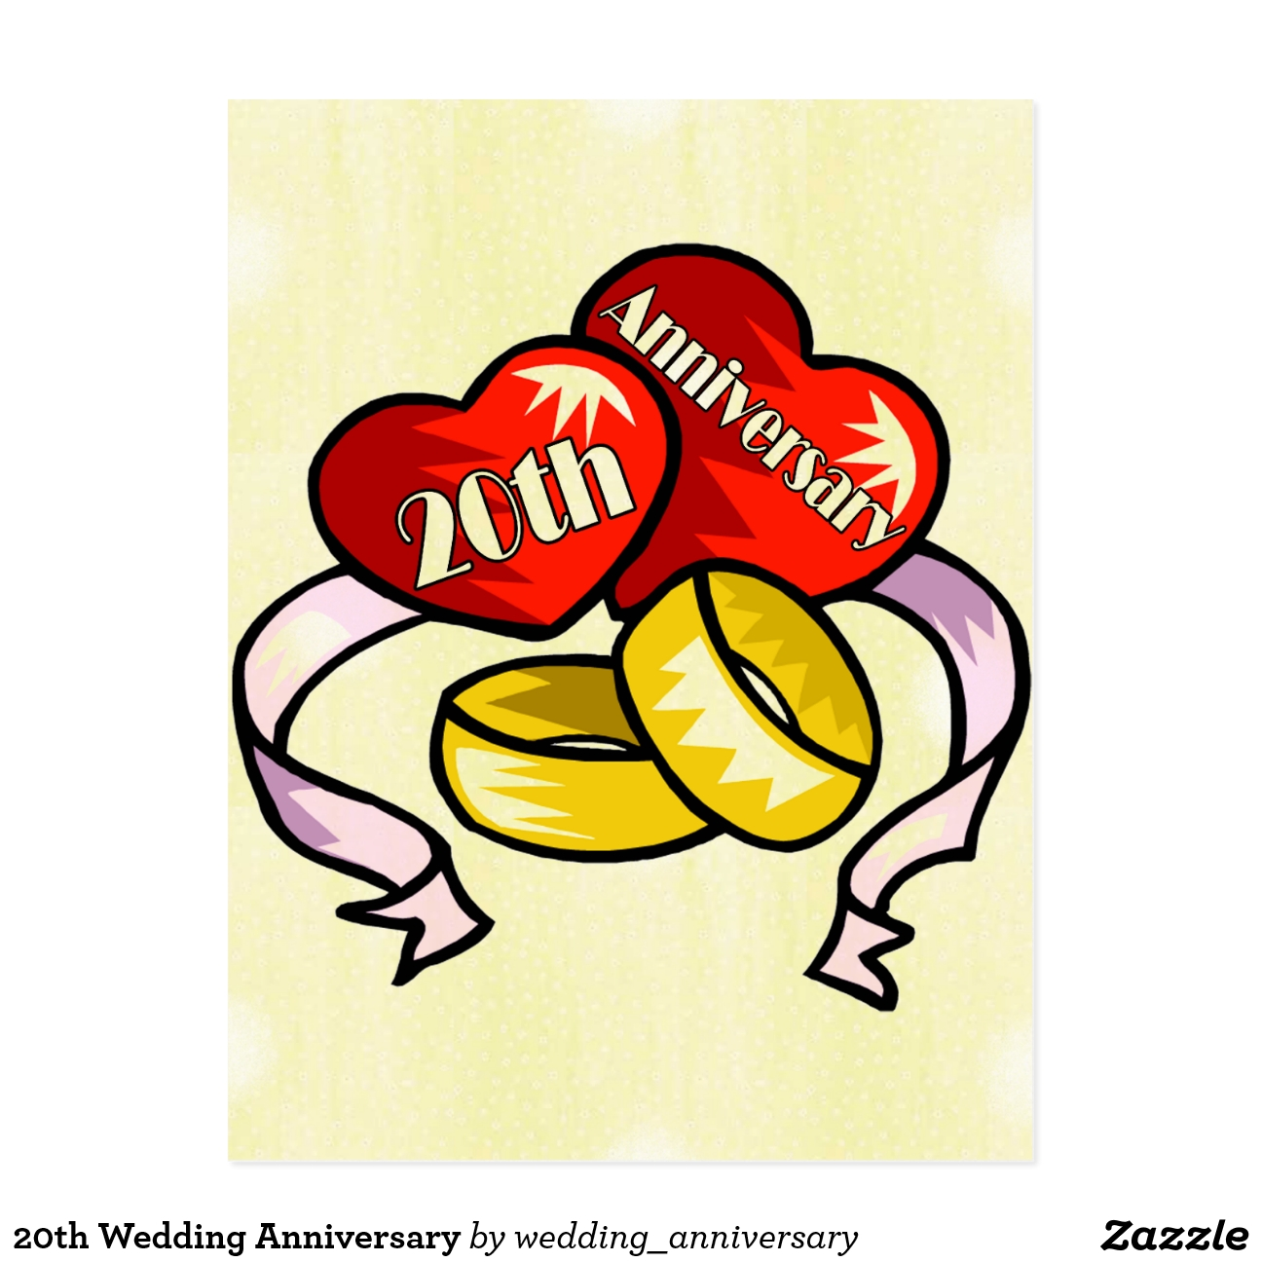 Vigésimo aniversario de boda